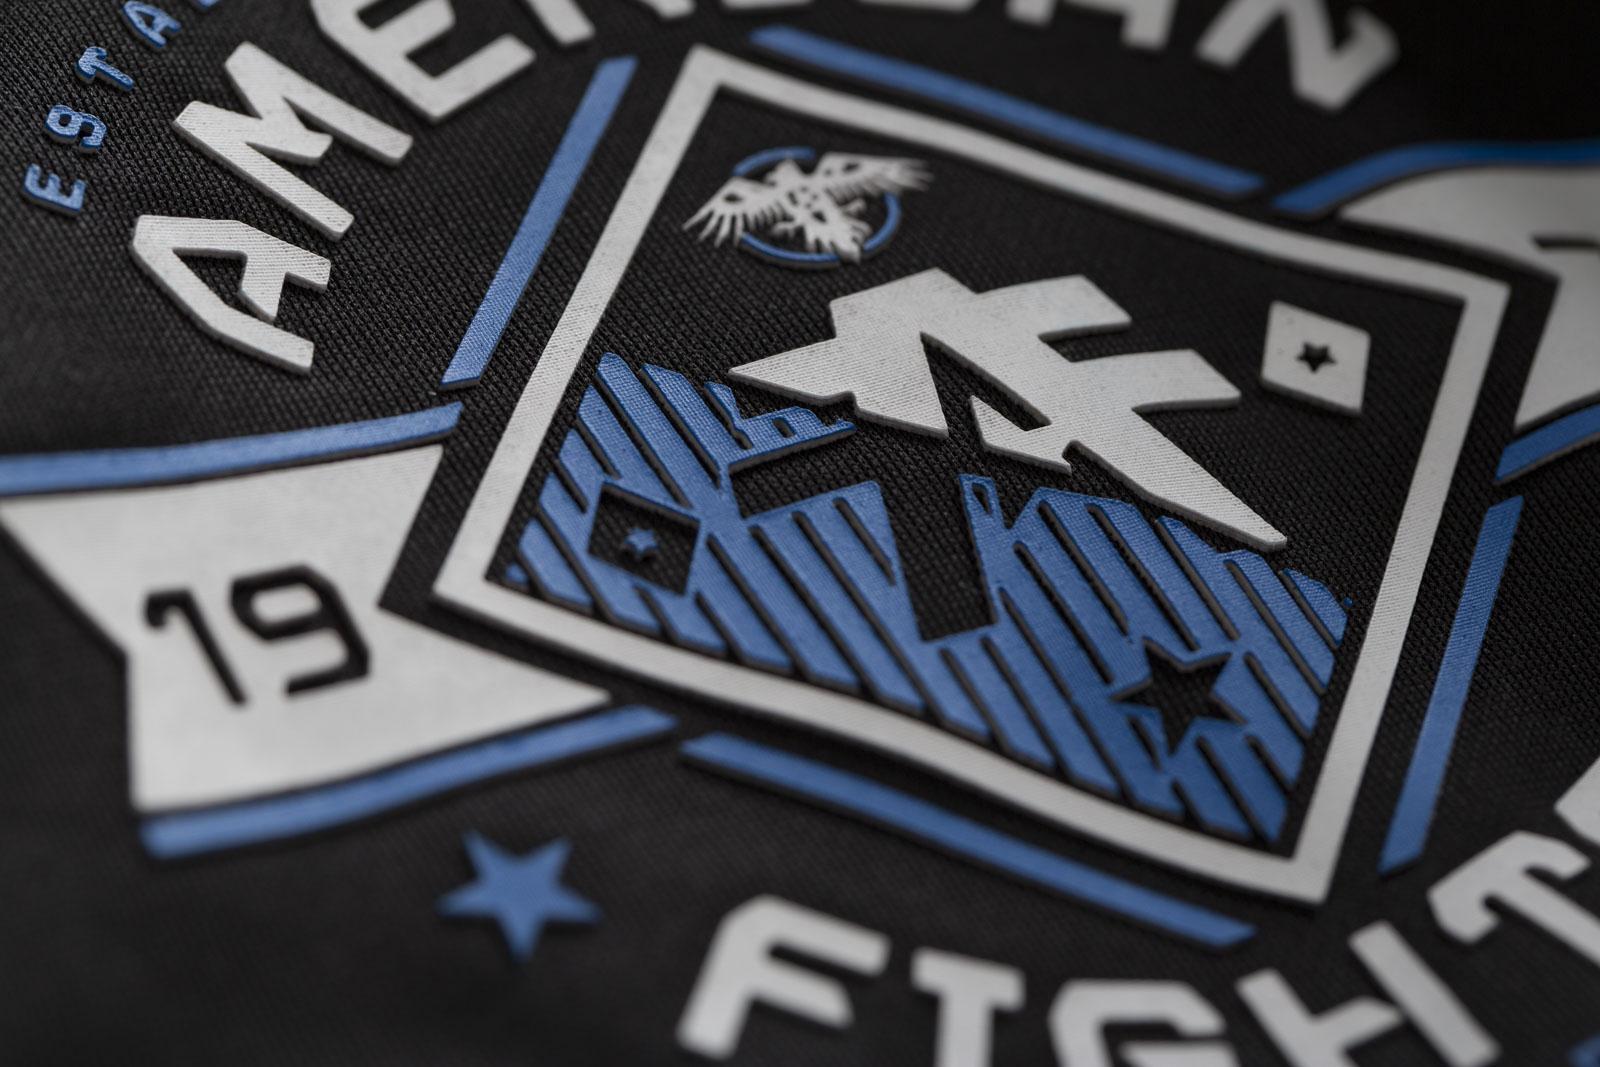 AMERICAN FIGHTER Affliction Track Jacket Full Full Full Back Schwarz Jacken d68eef